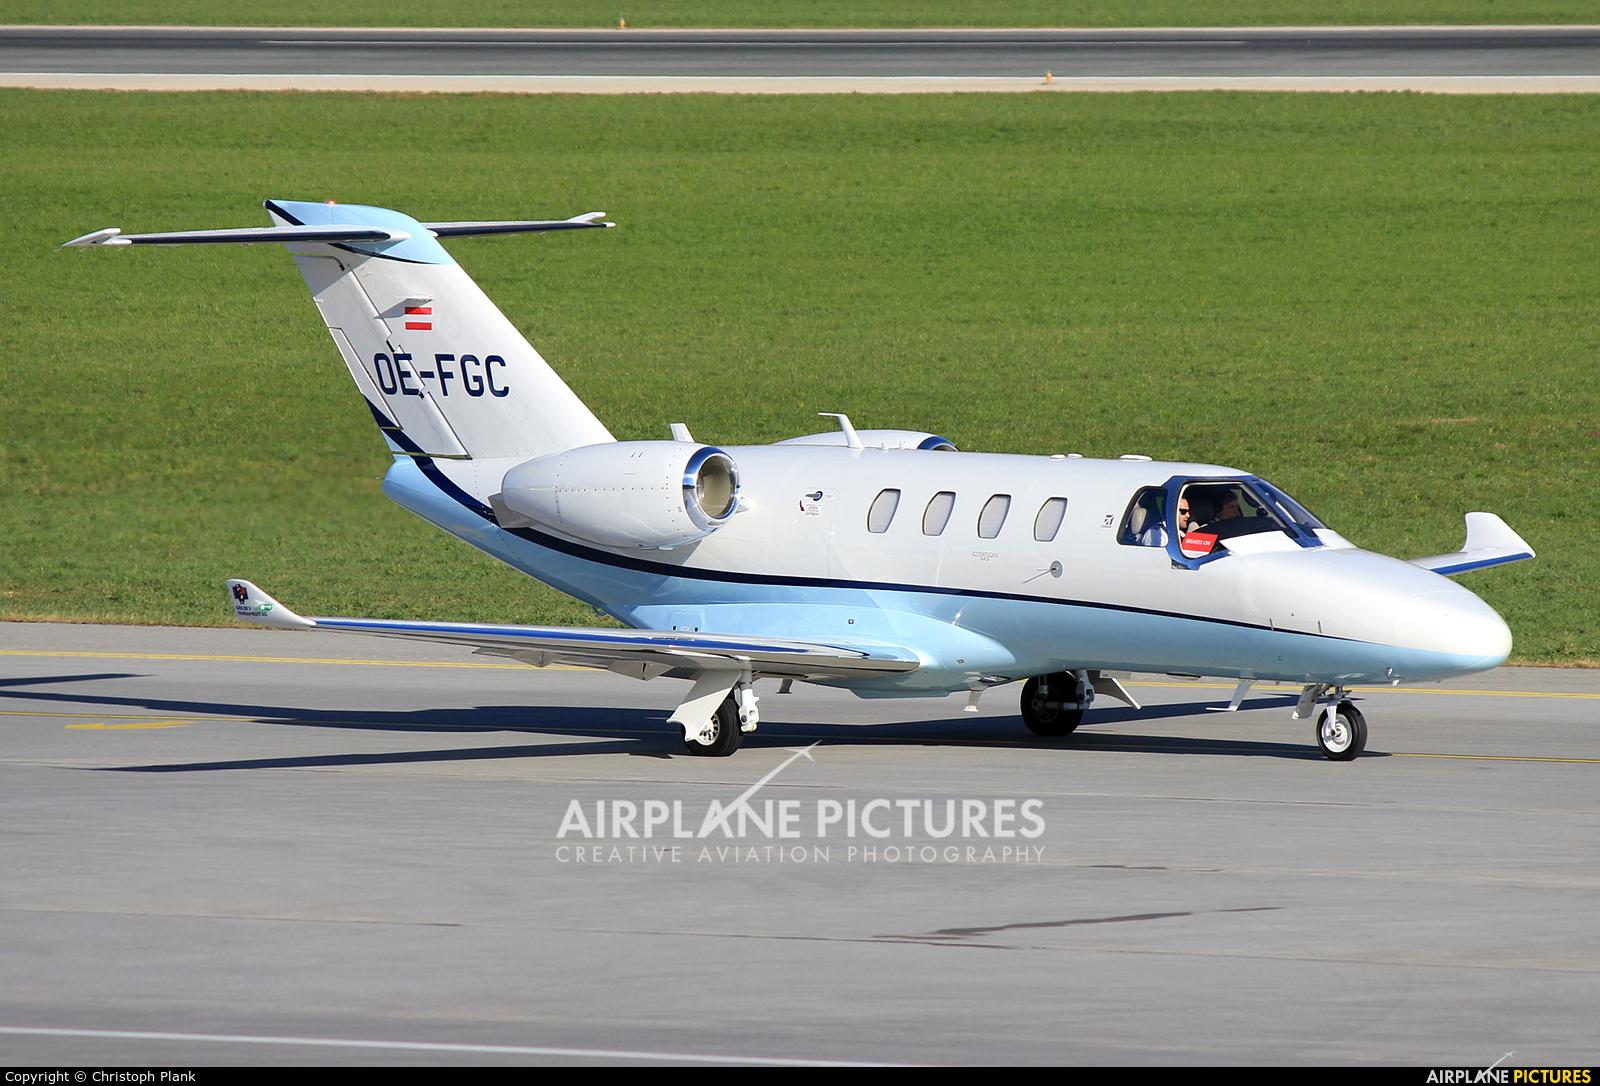 FlyTyrol OE-FGC aircraft at Innsbruck